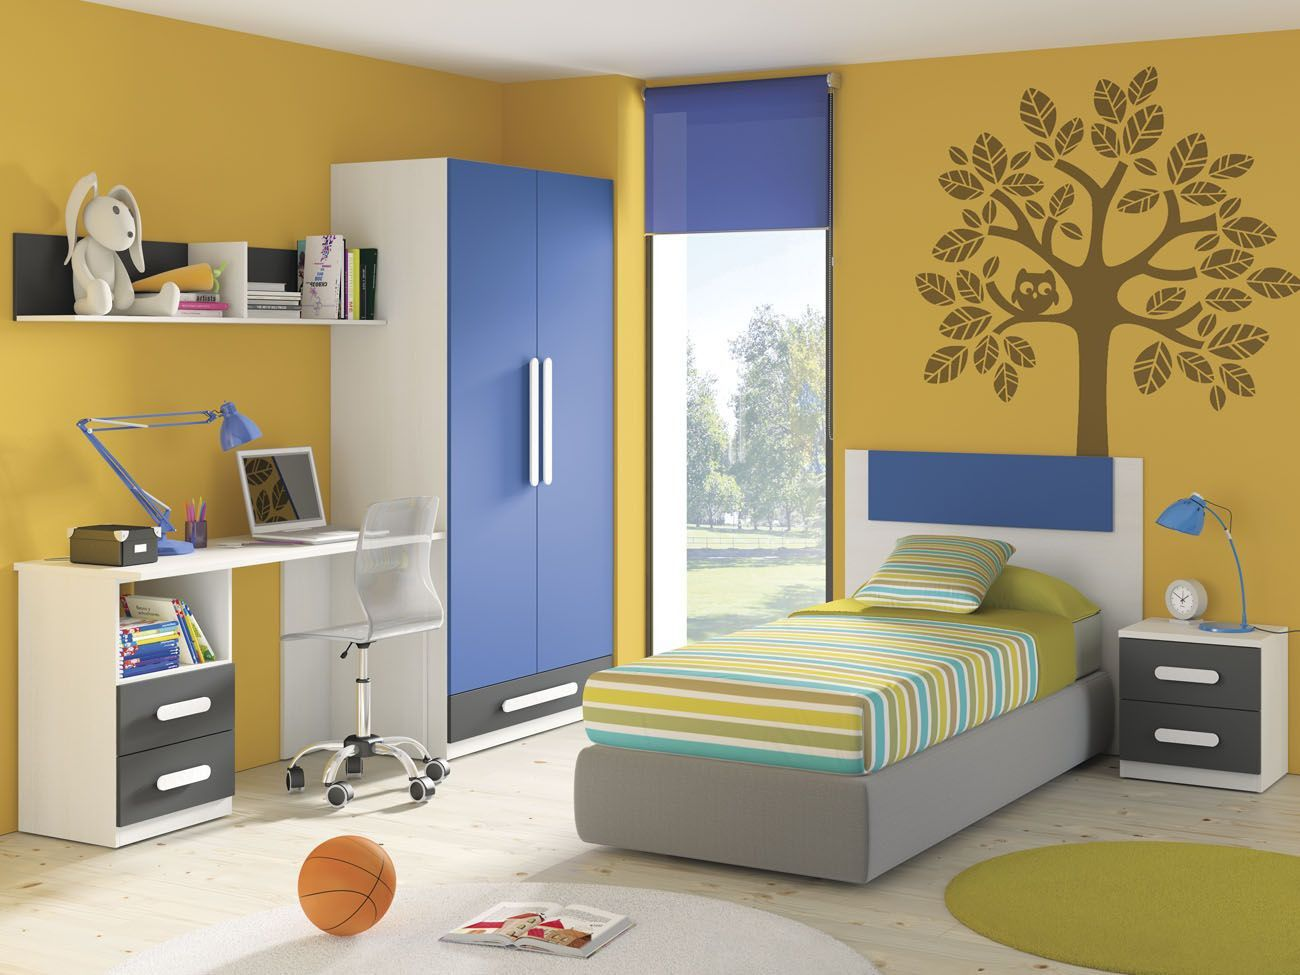 Iluminar el dormitorio infantil o juvenil el blog - Mueble juvenil diseno ...